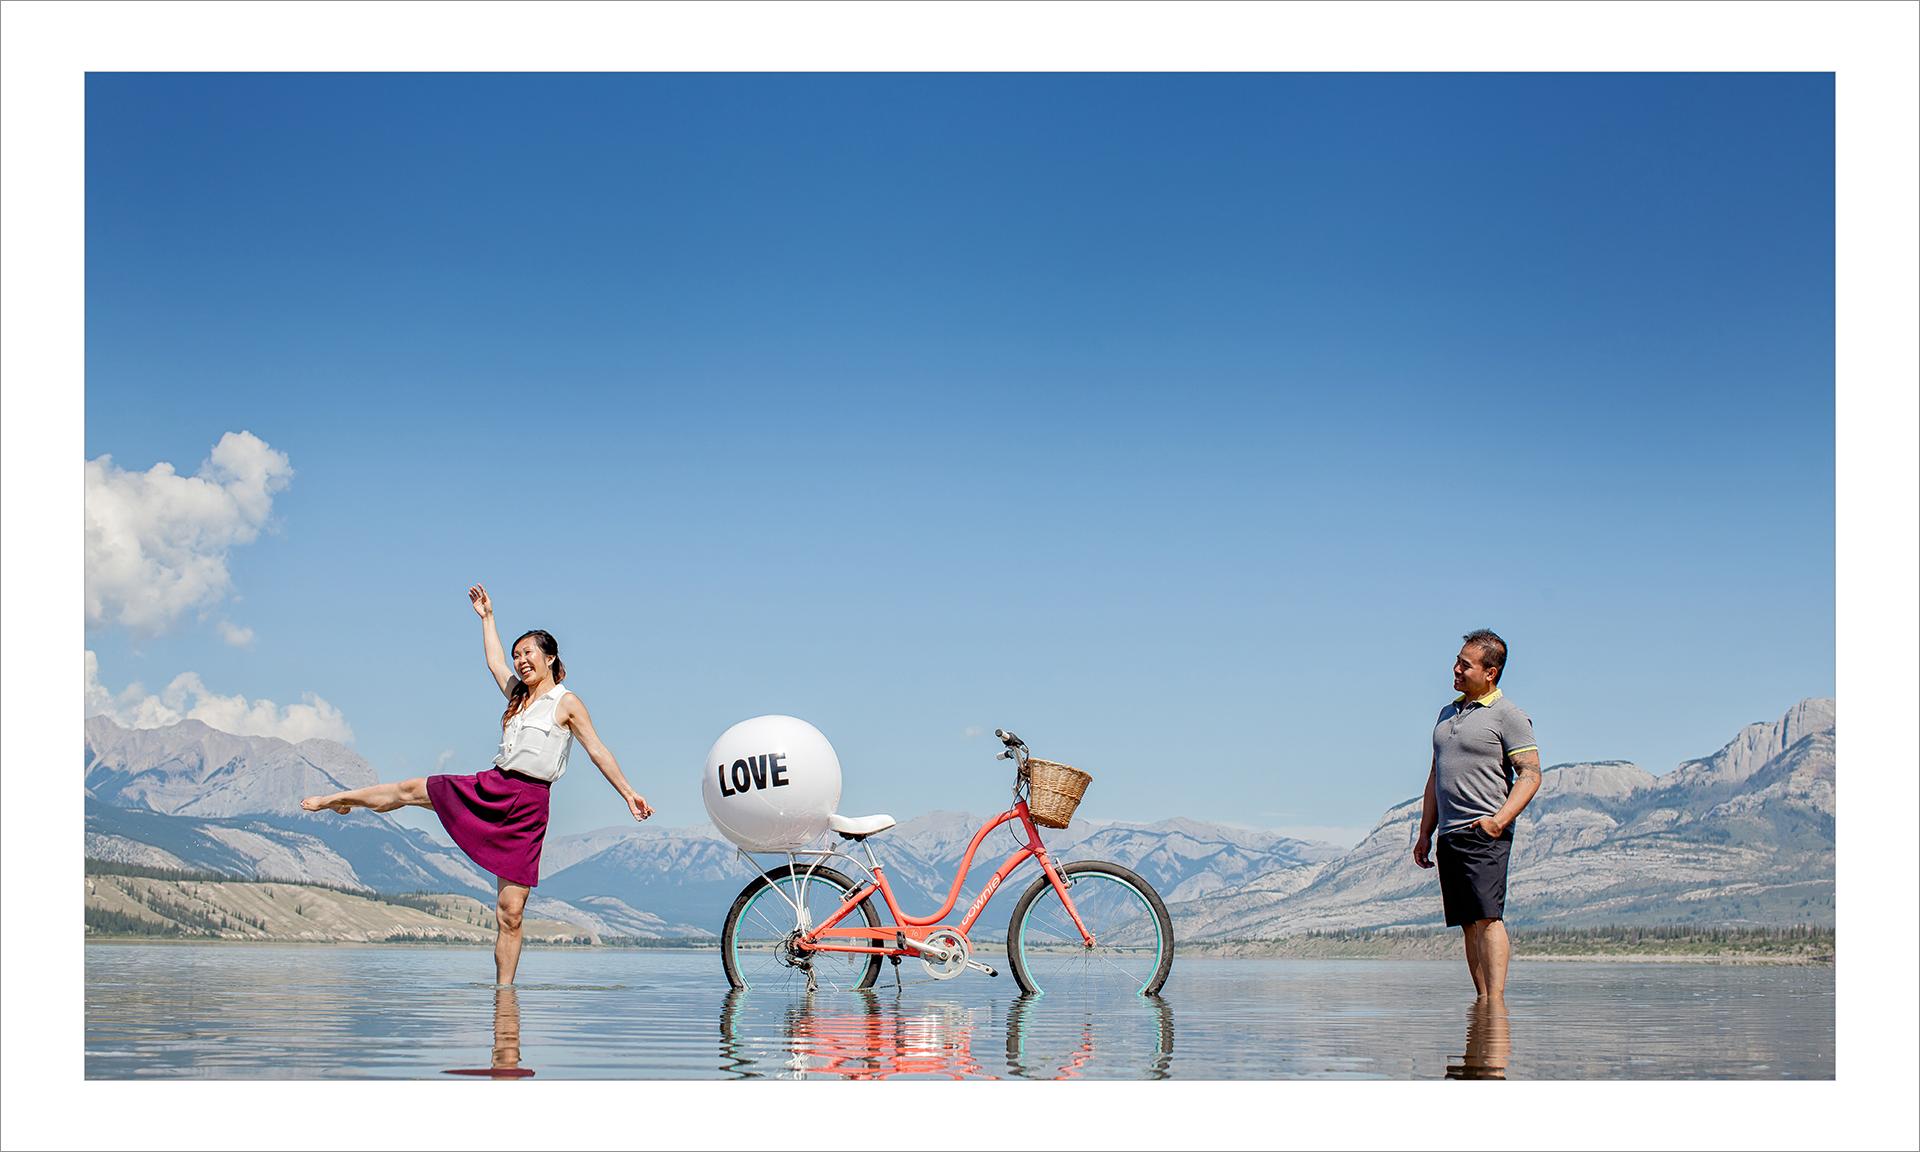 Award winning engagement photography album :: pgs 7-8 Bicycle on lake